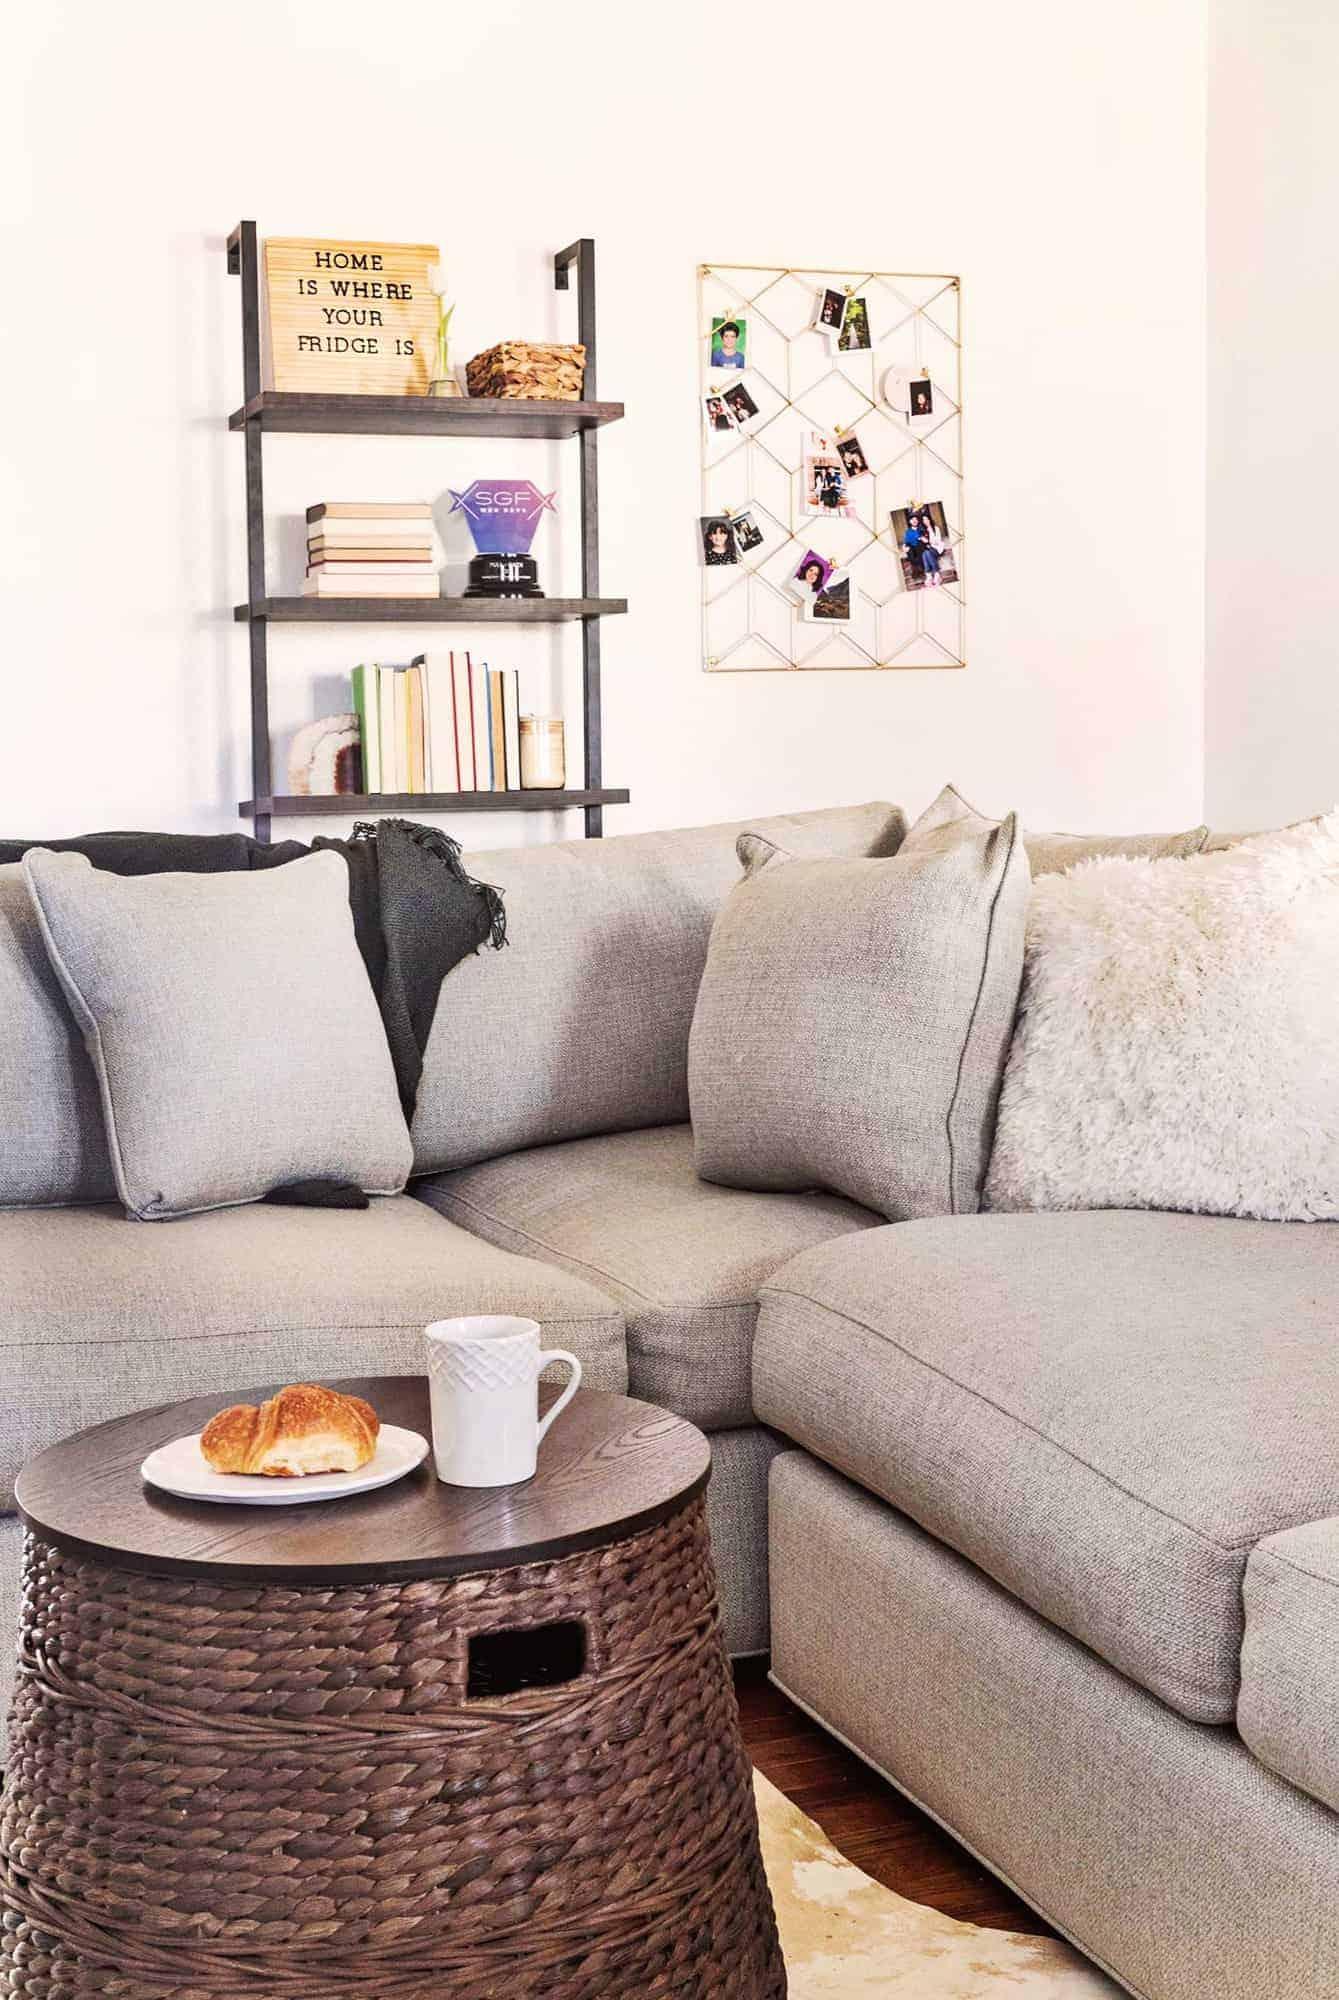 8 ways to add storage to your home